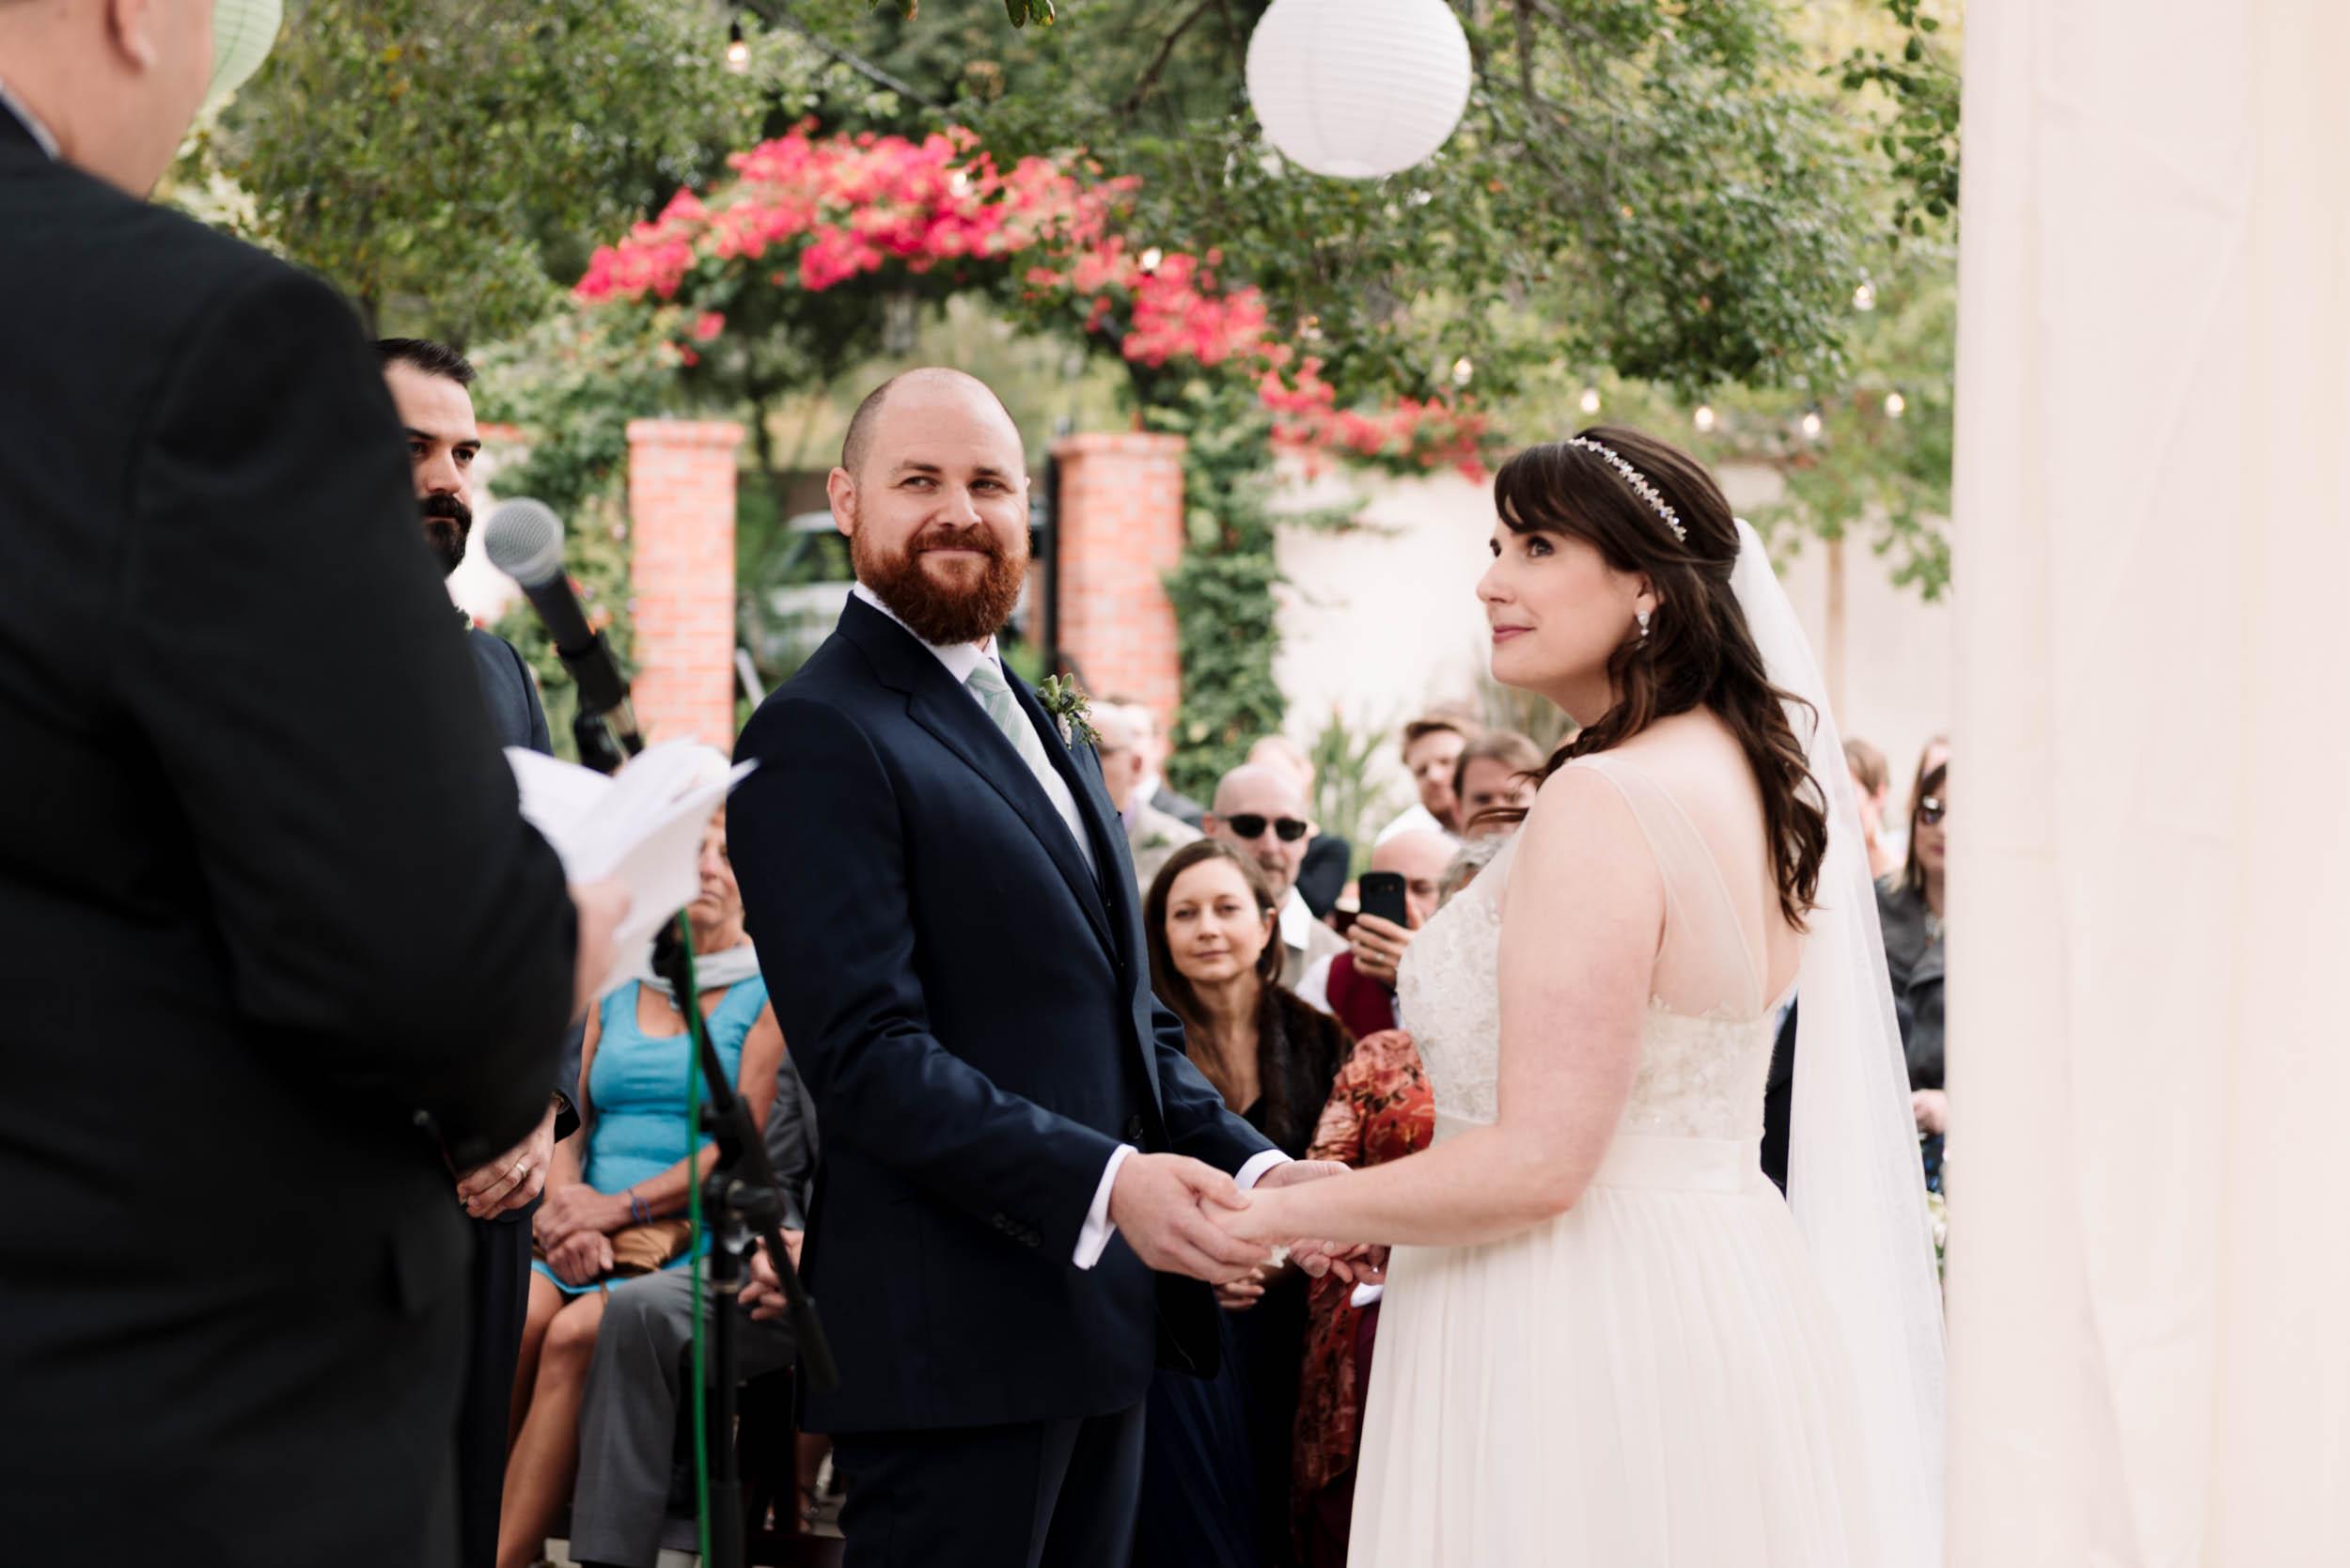 Desination_Wedding_Los Angeles-12.jpg